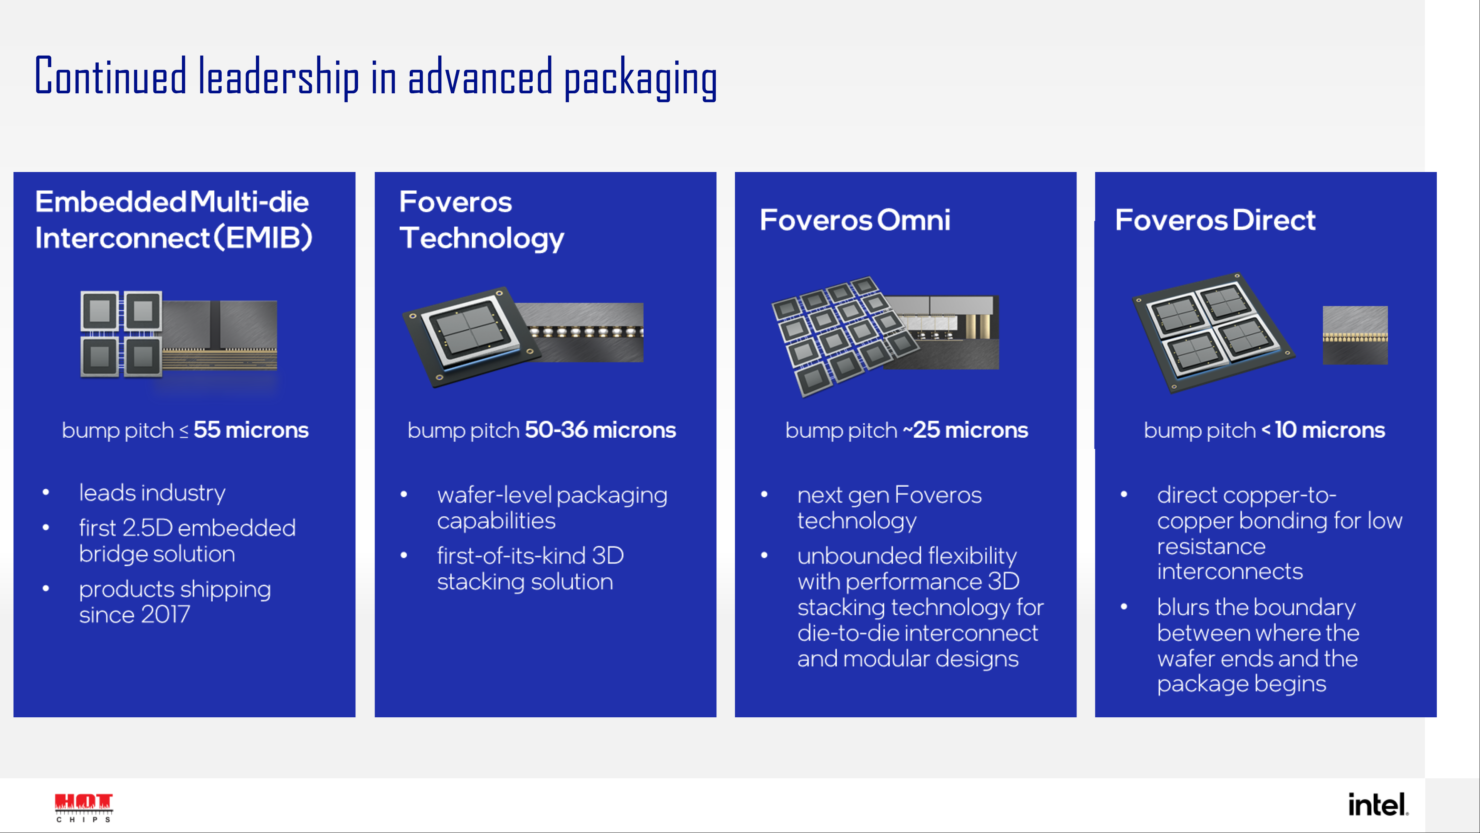 intel-sapphire-rapids-sp-xeon-hbm-cpu-ponte-vecchio-gpu-with-emib-forveros-packaging-technologies-_9